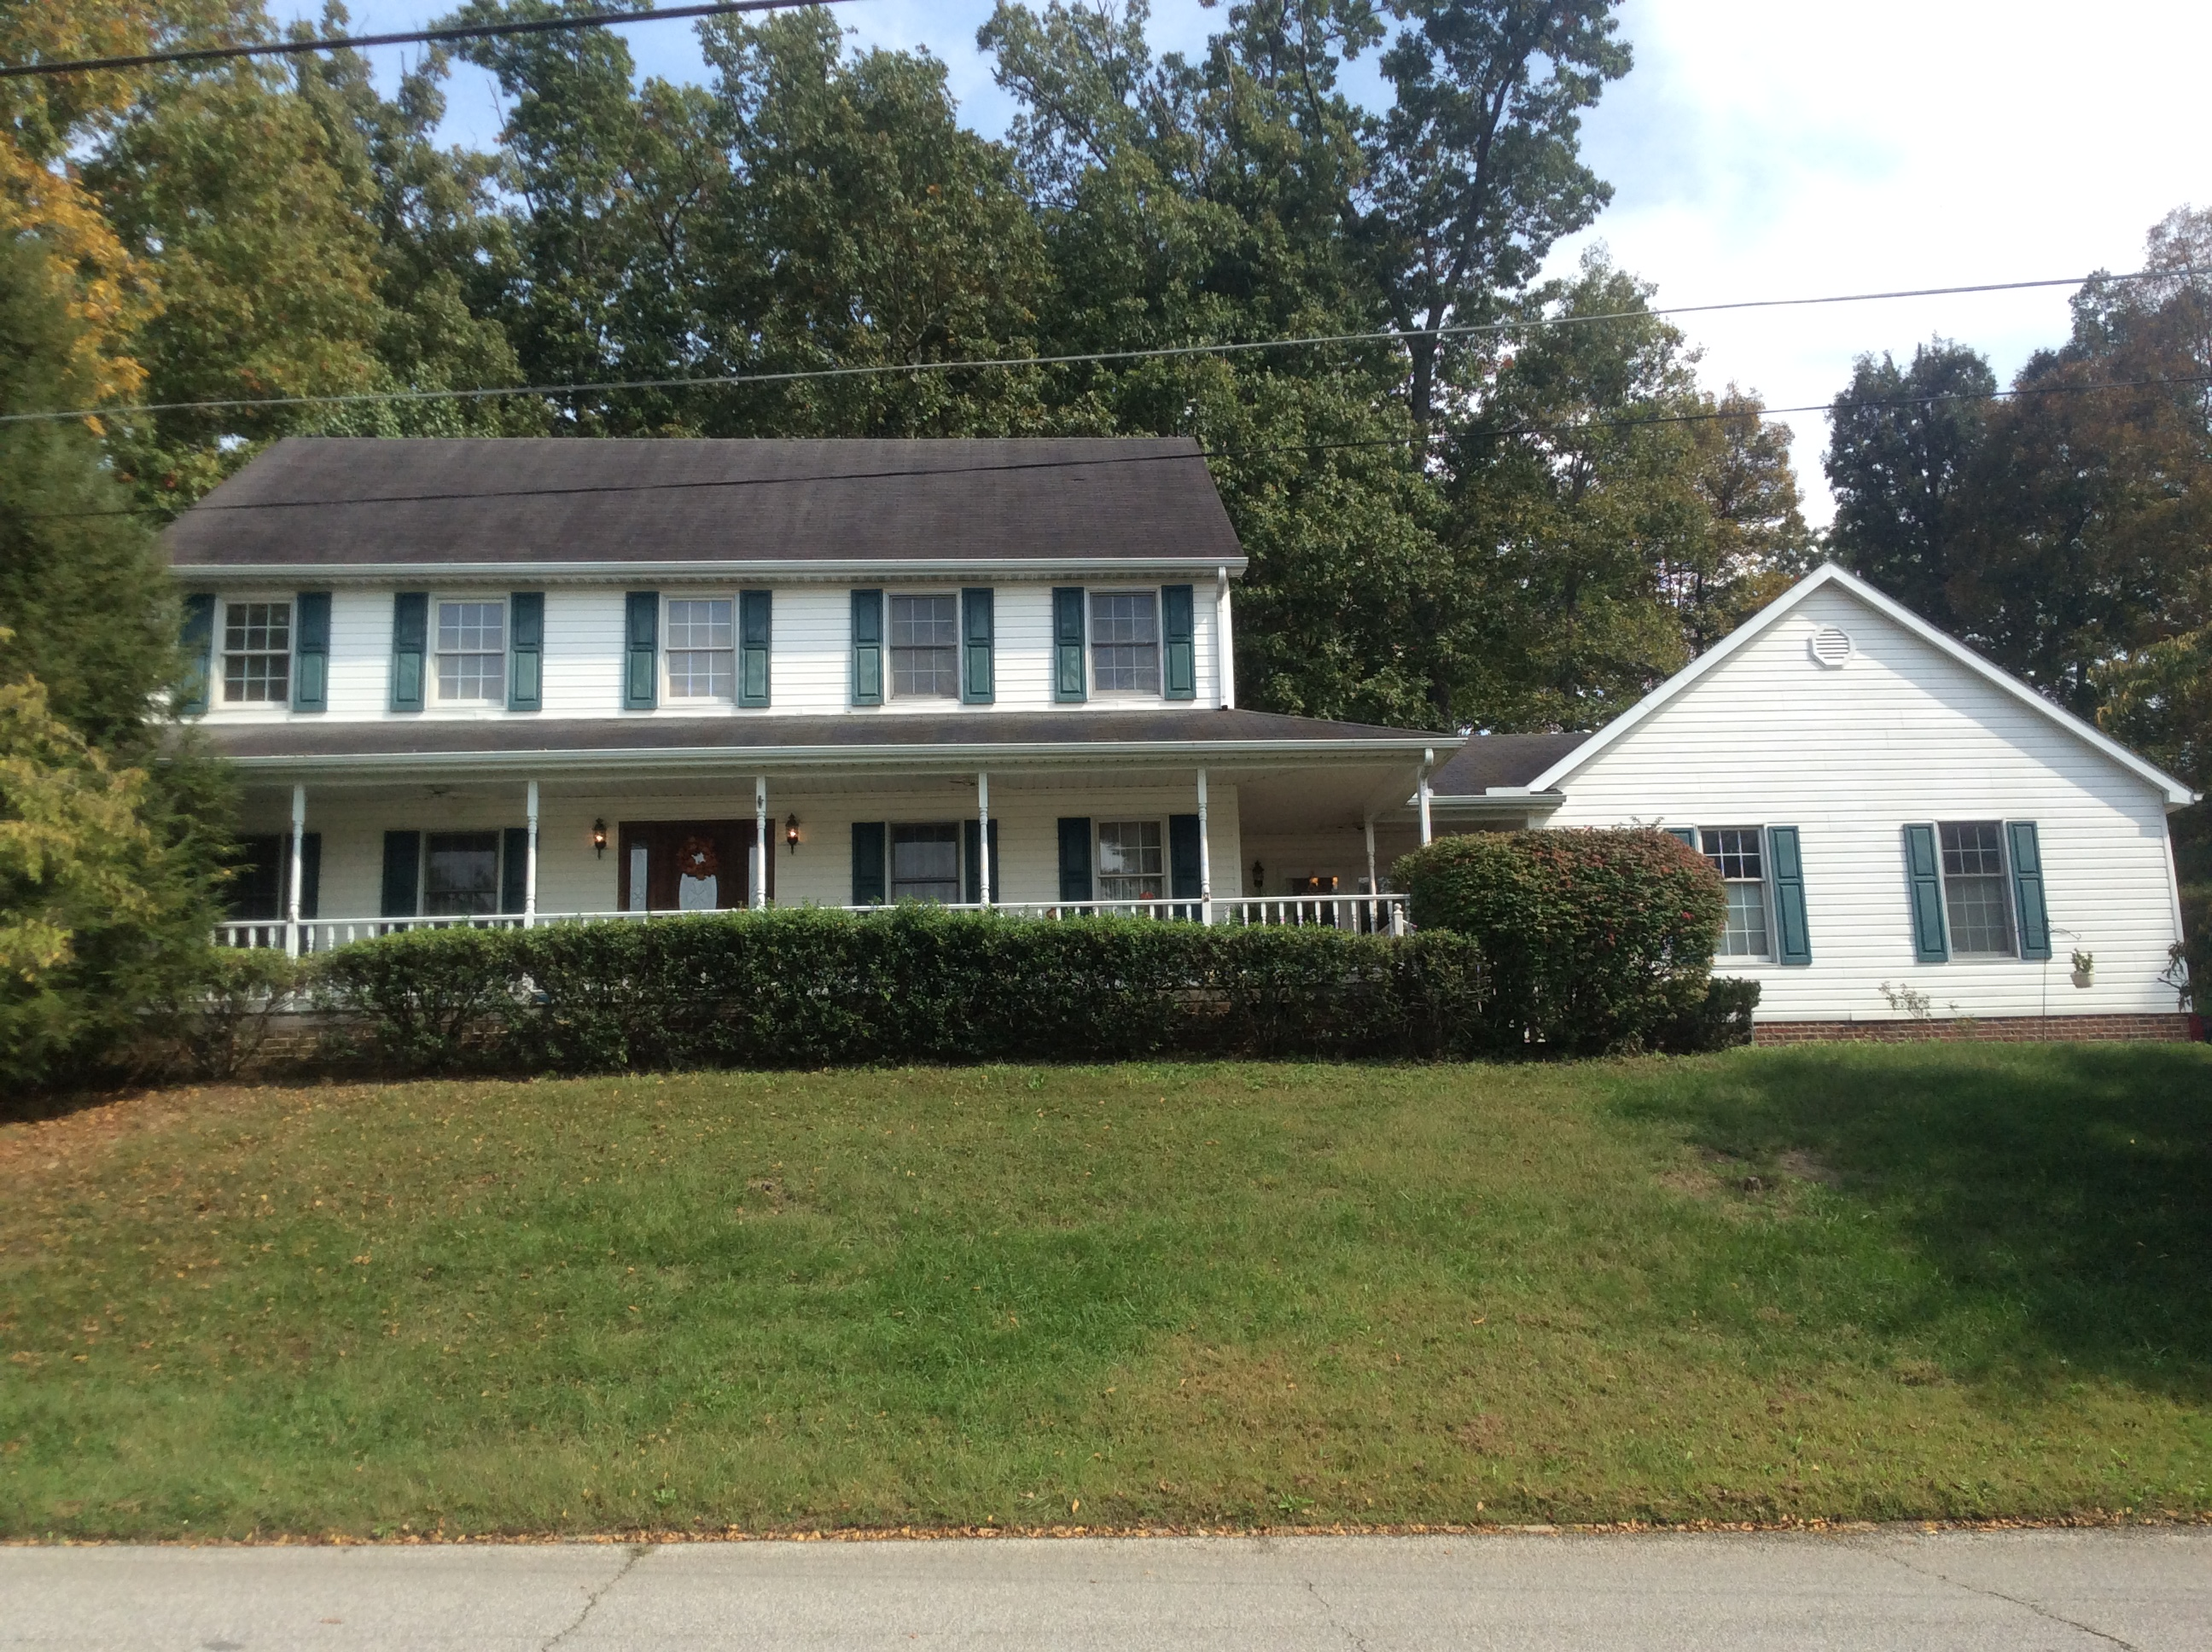 20 Persimmon Lane, Huntington, West Virginia 25705